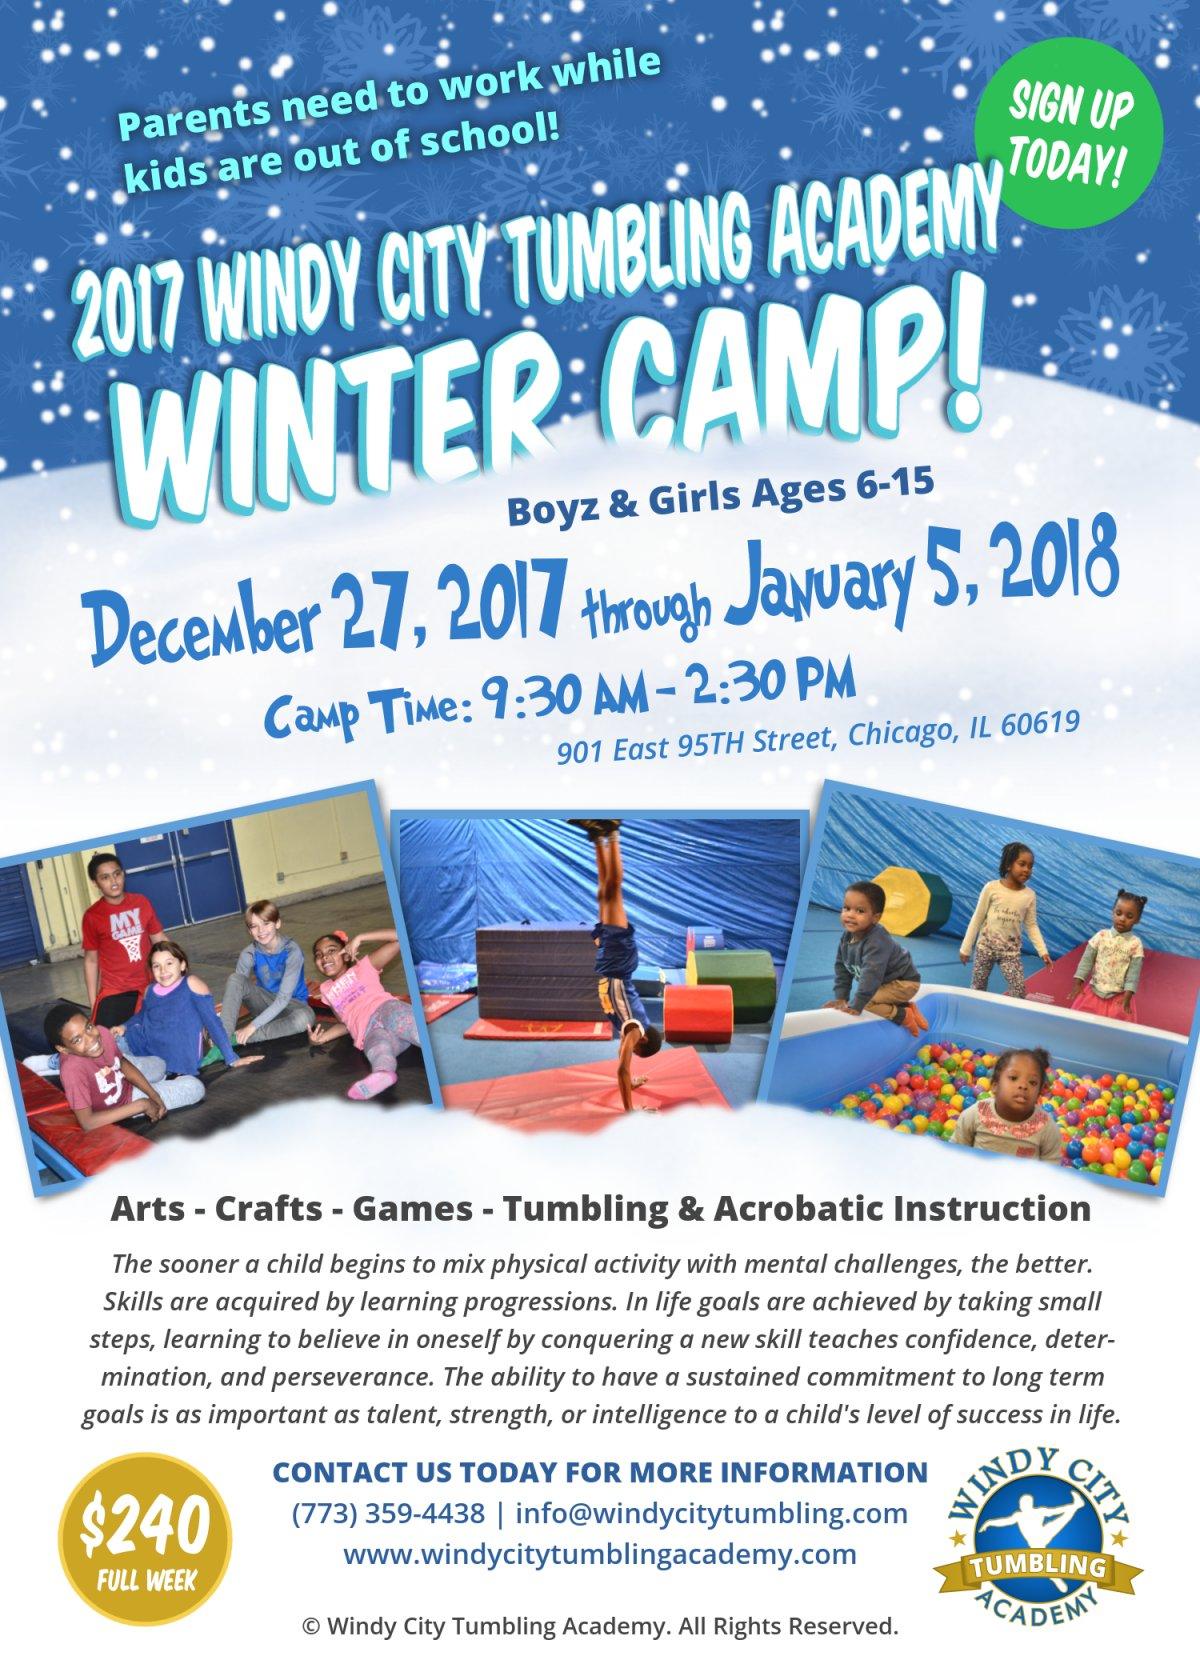 wcta-winter-camp-2017-web-flyer